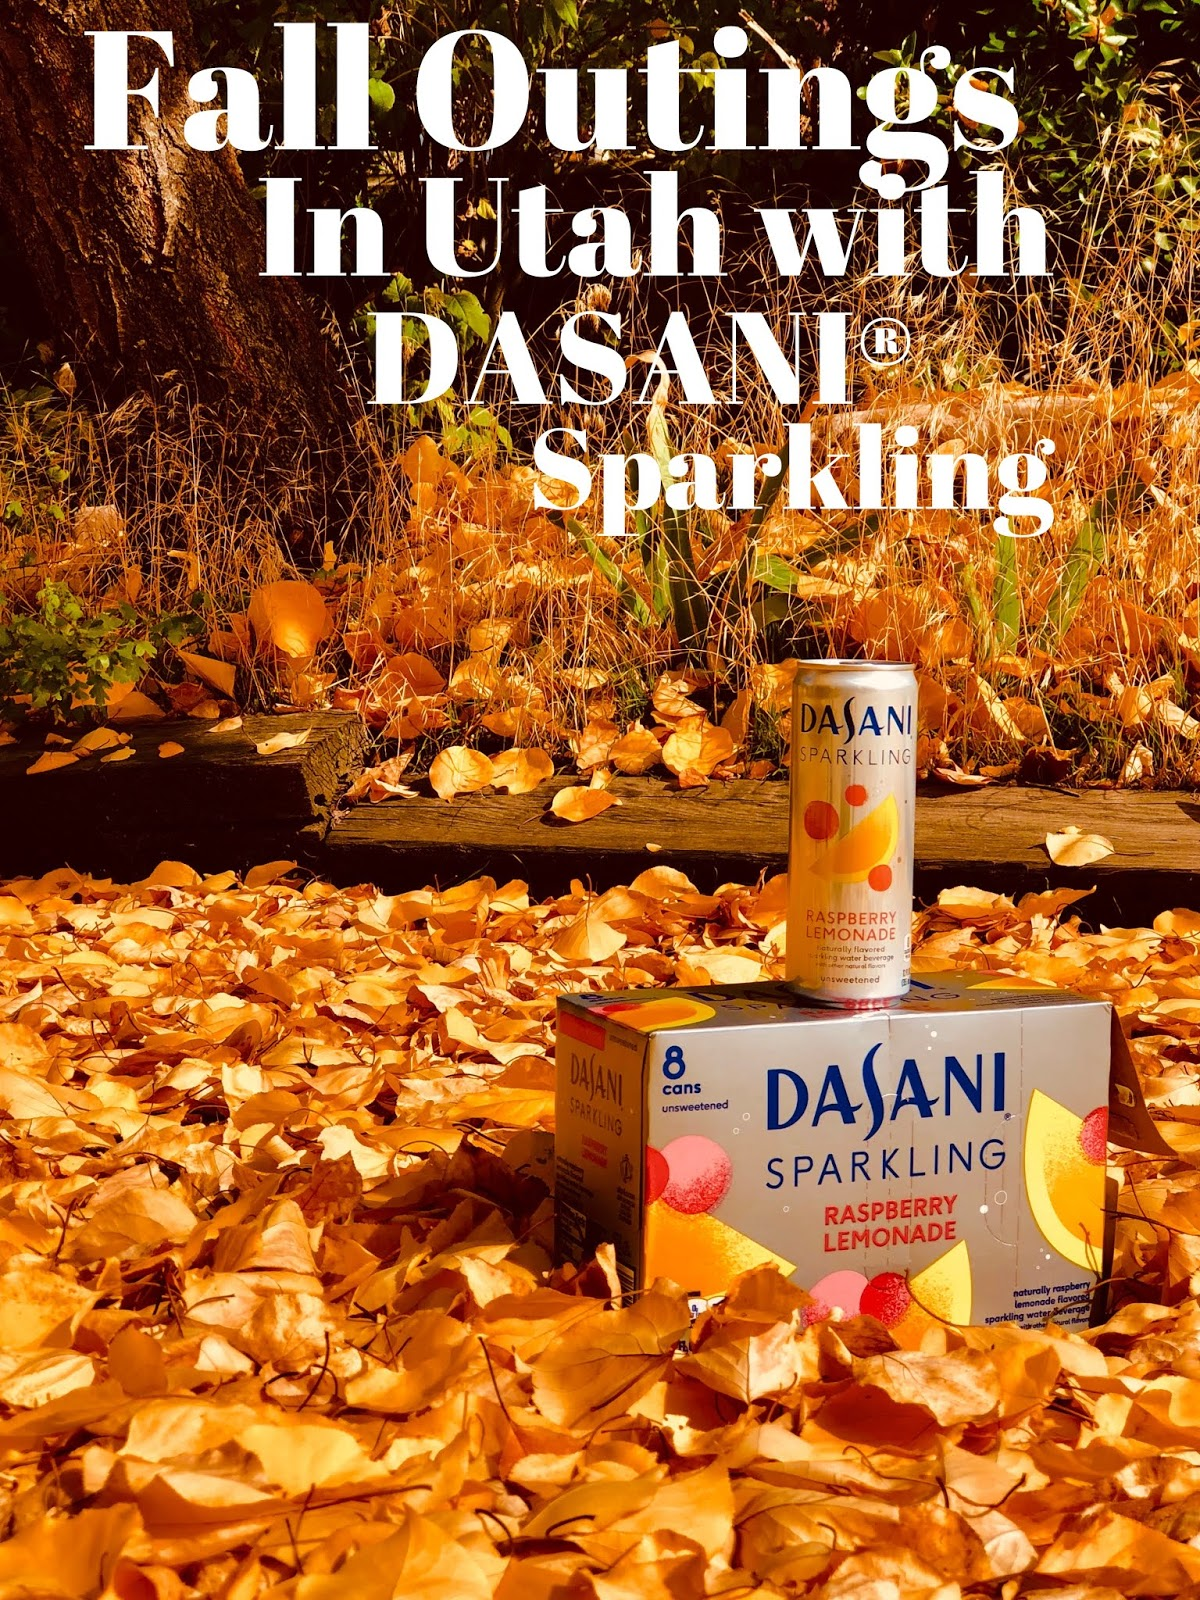 apple picking, DASANI®, DASANI® Sparkling, fall outings in utah, gardener village, how to keep hydrated with DASANI®, road trips, what to do in utah,